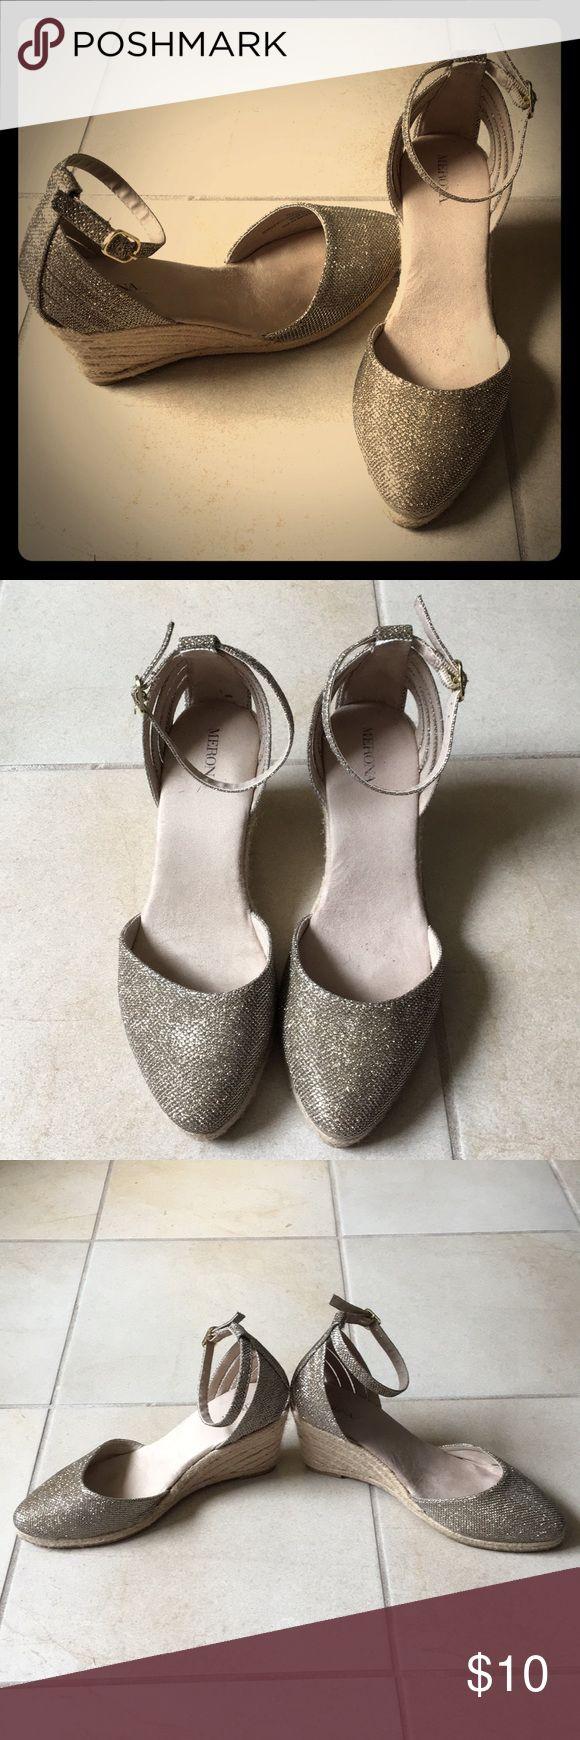 Gold wedge heels - size 7.5 (runs big) Gold wedge heels - size 7.5 (but fits like 8.5). Worn 3x. Smoke-free home. GUC. Merona Shoes Wedges